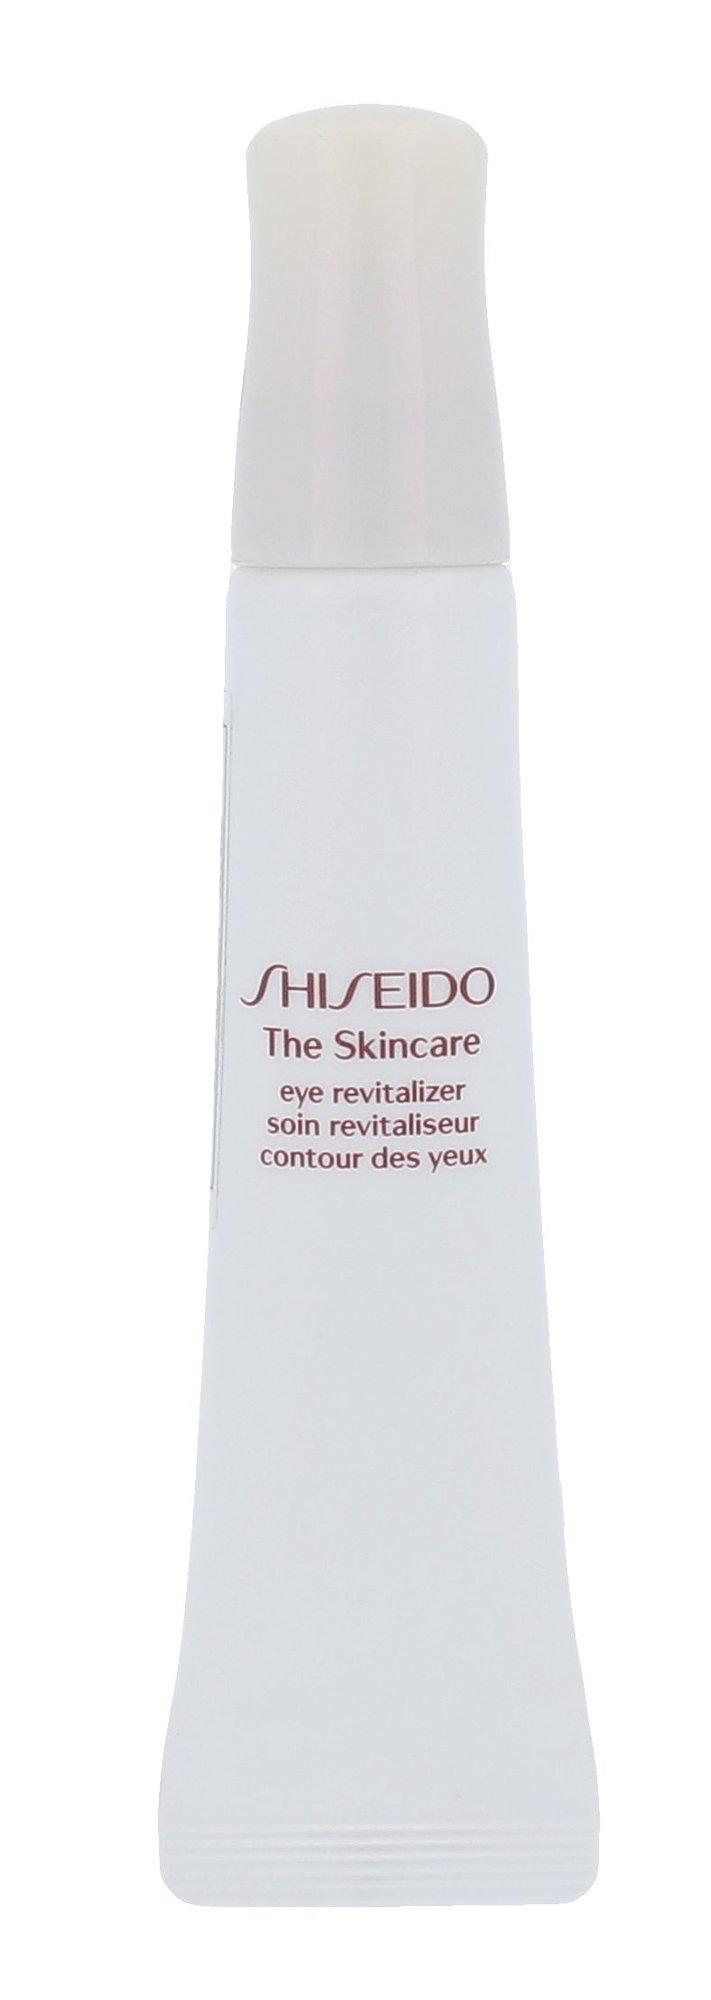 Shiseido The Skincare Cosmetic 15ml